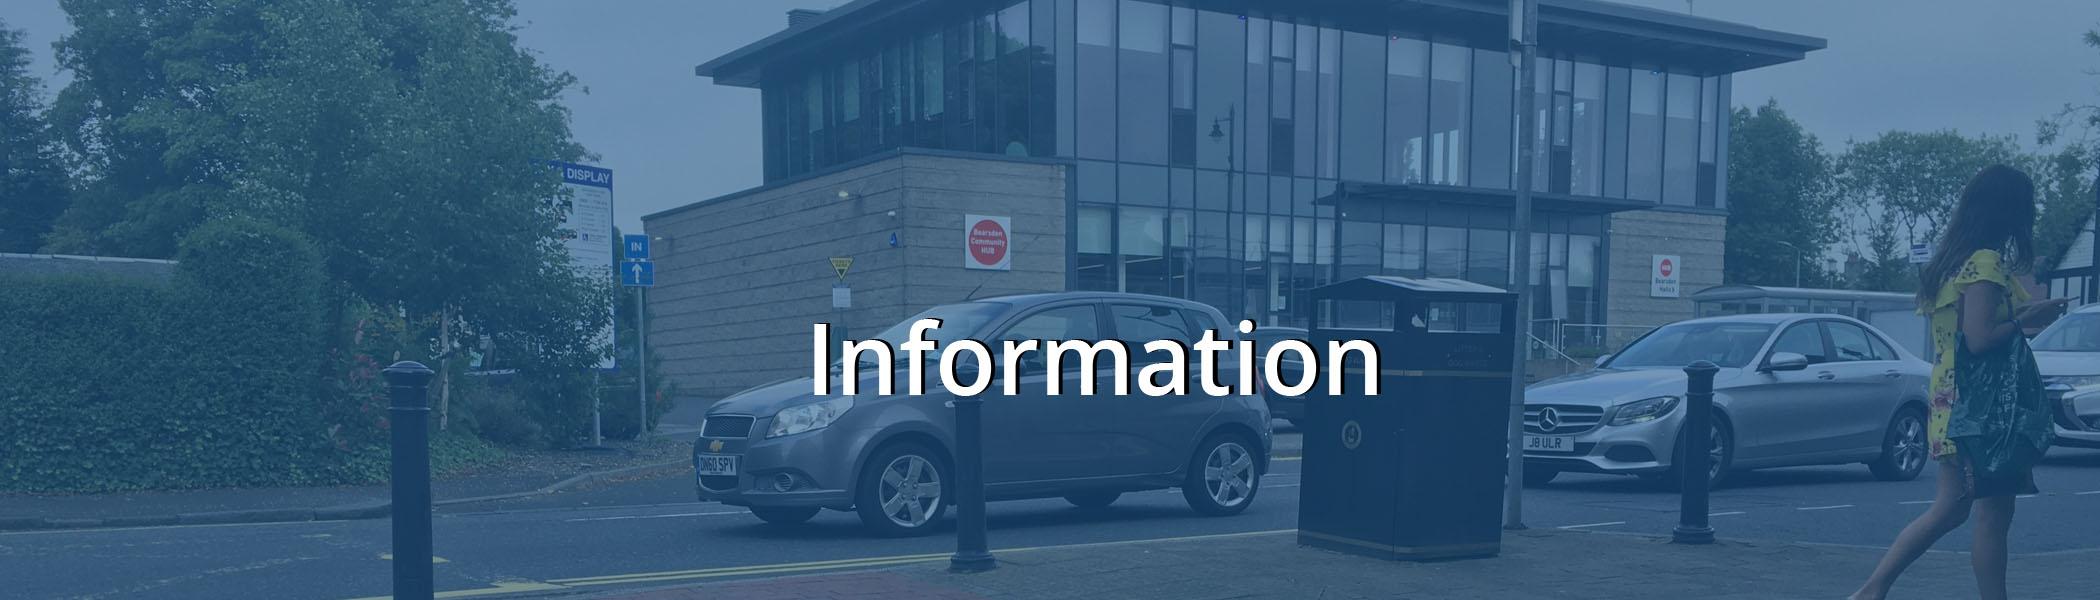 Bearsden Loves Local Information